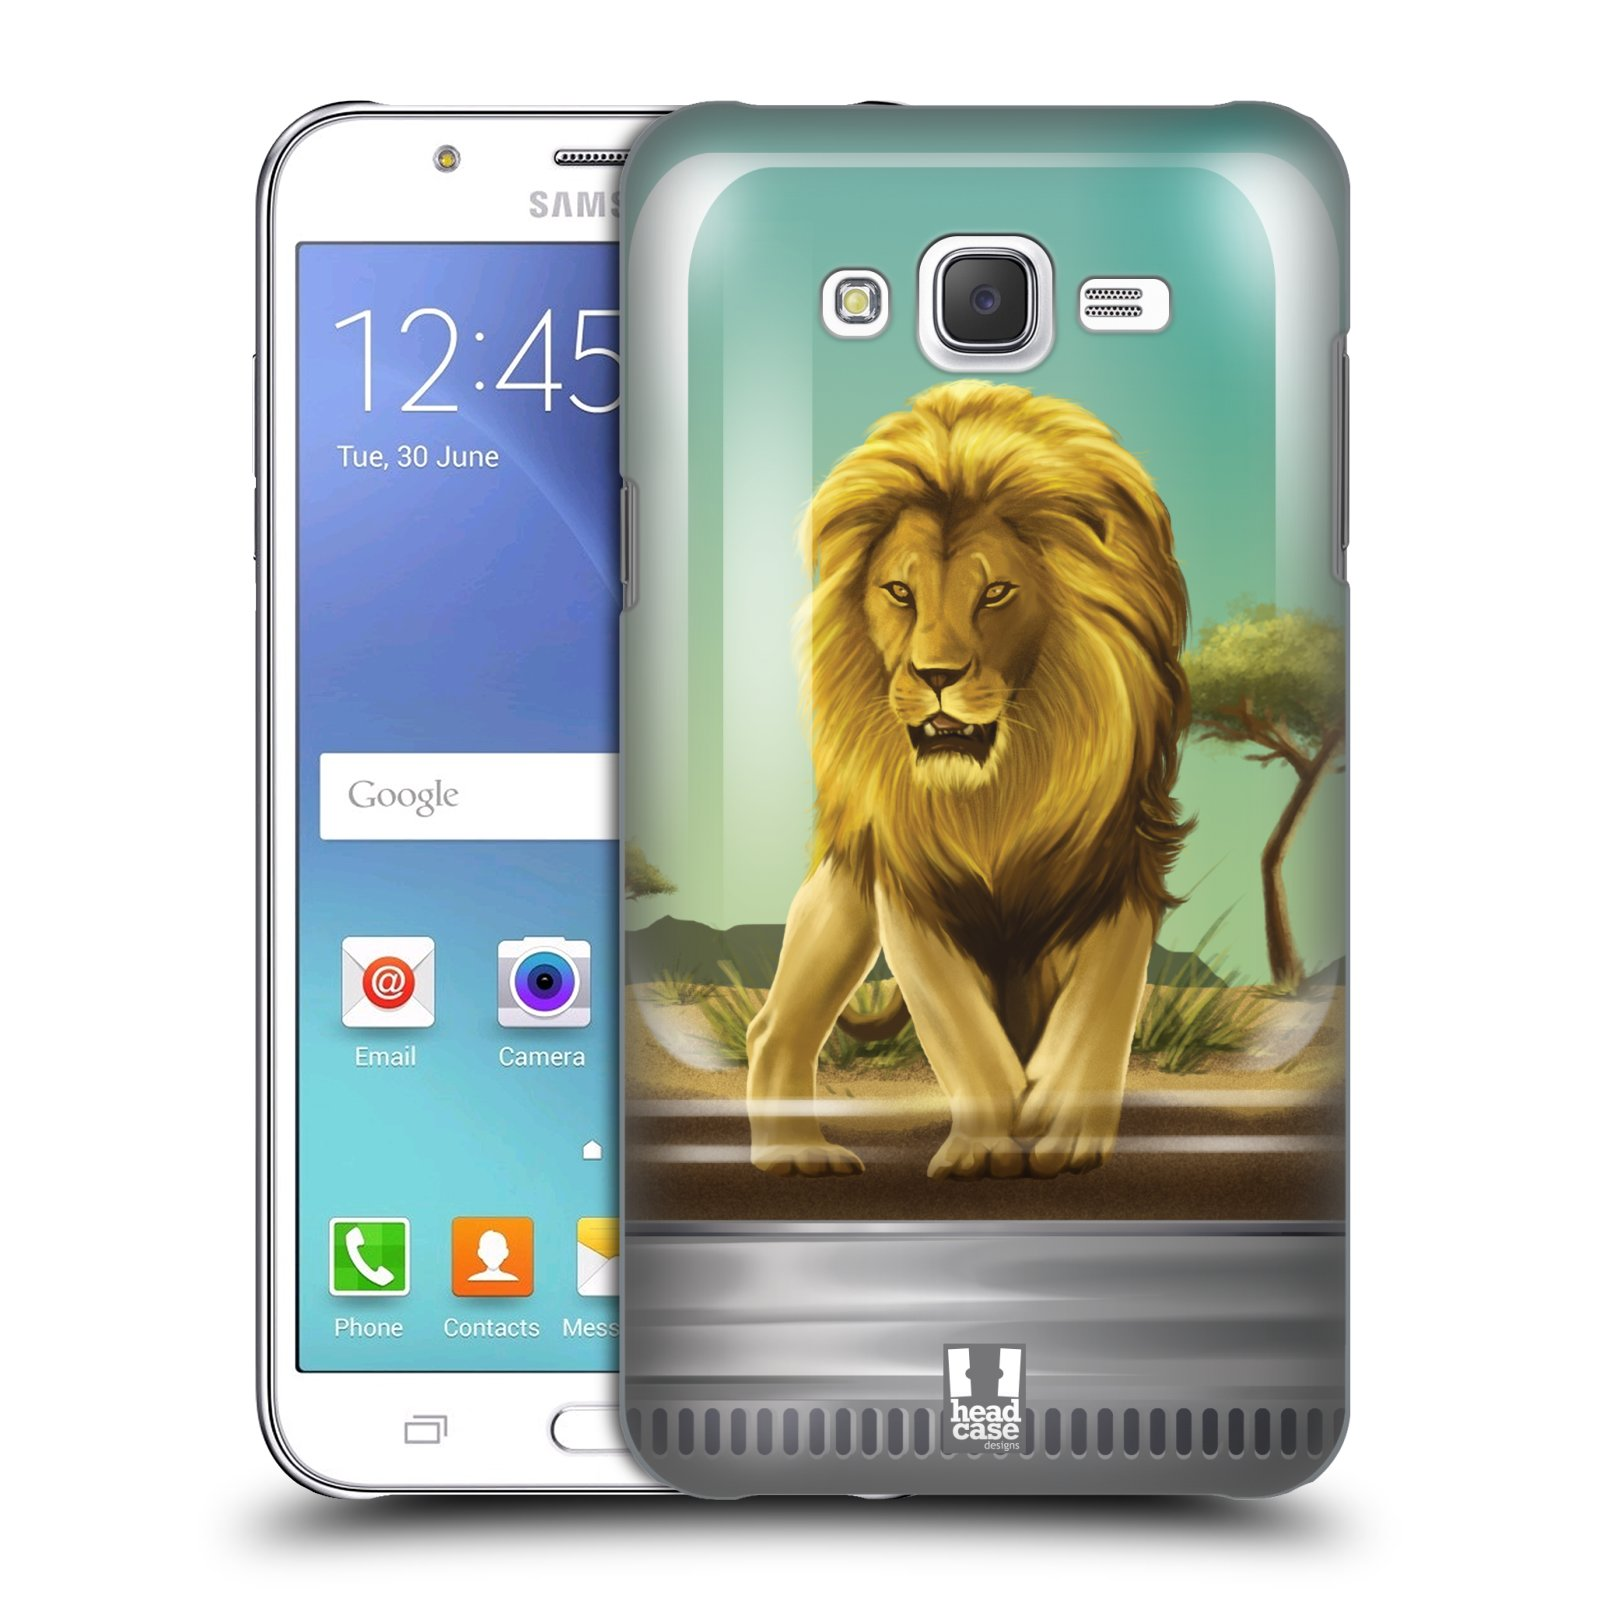 HEAD CASE plastový obal na mobil SAMSUNG Galaxy J7, J700 vzor Zvířátka v těžítku lev